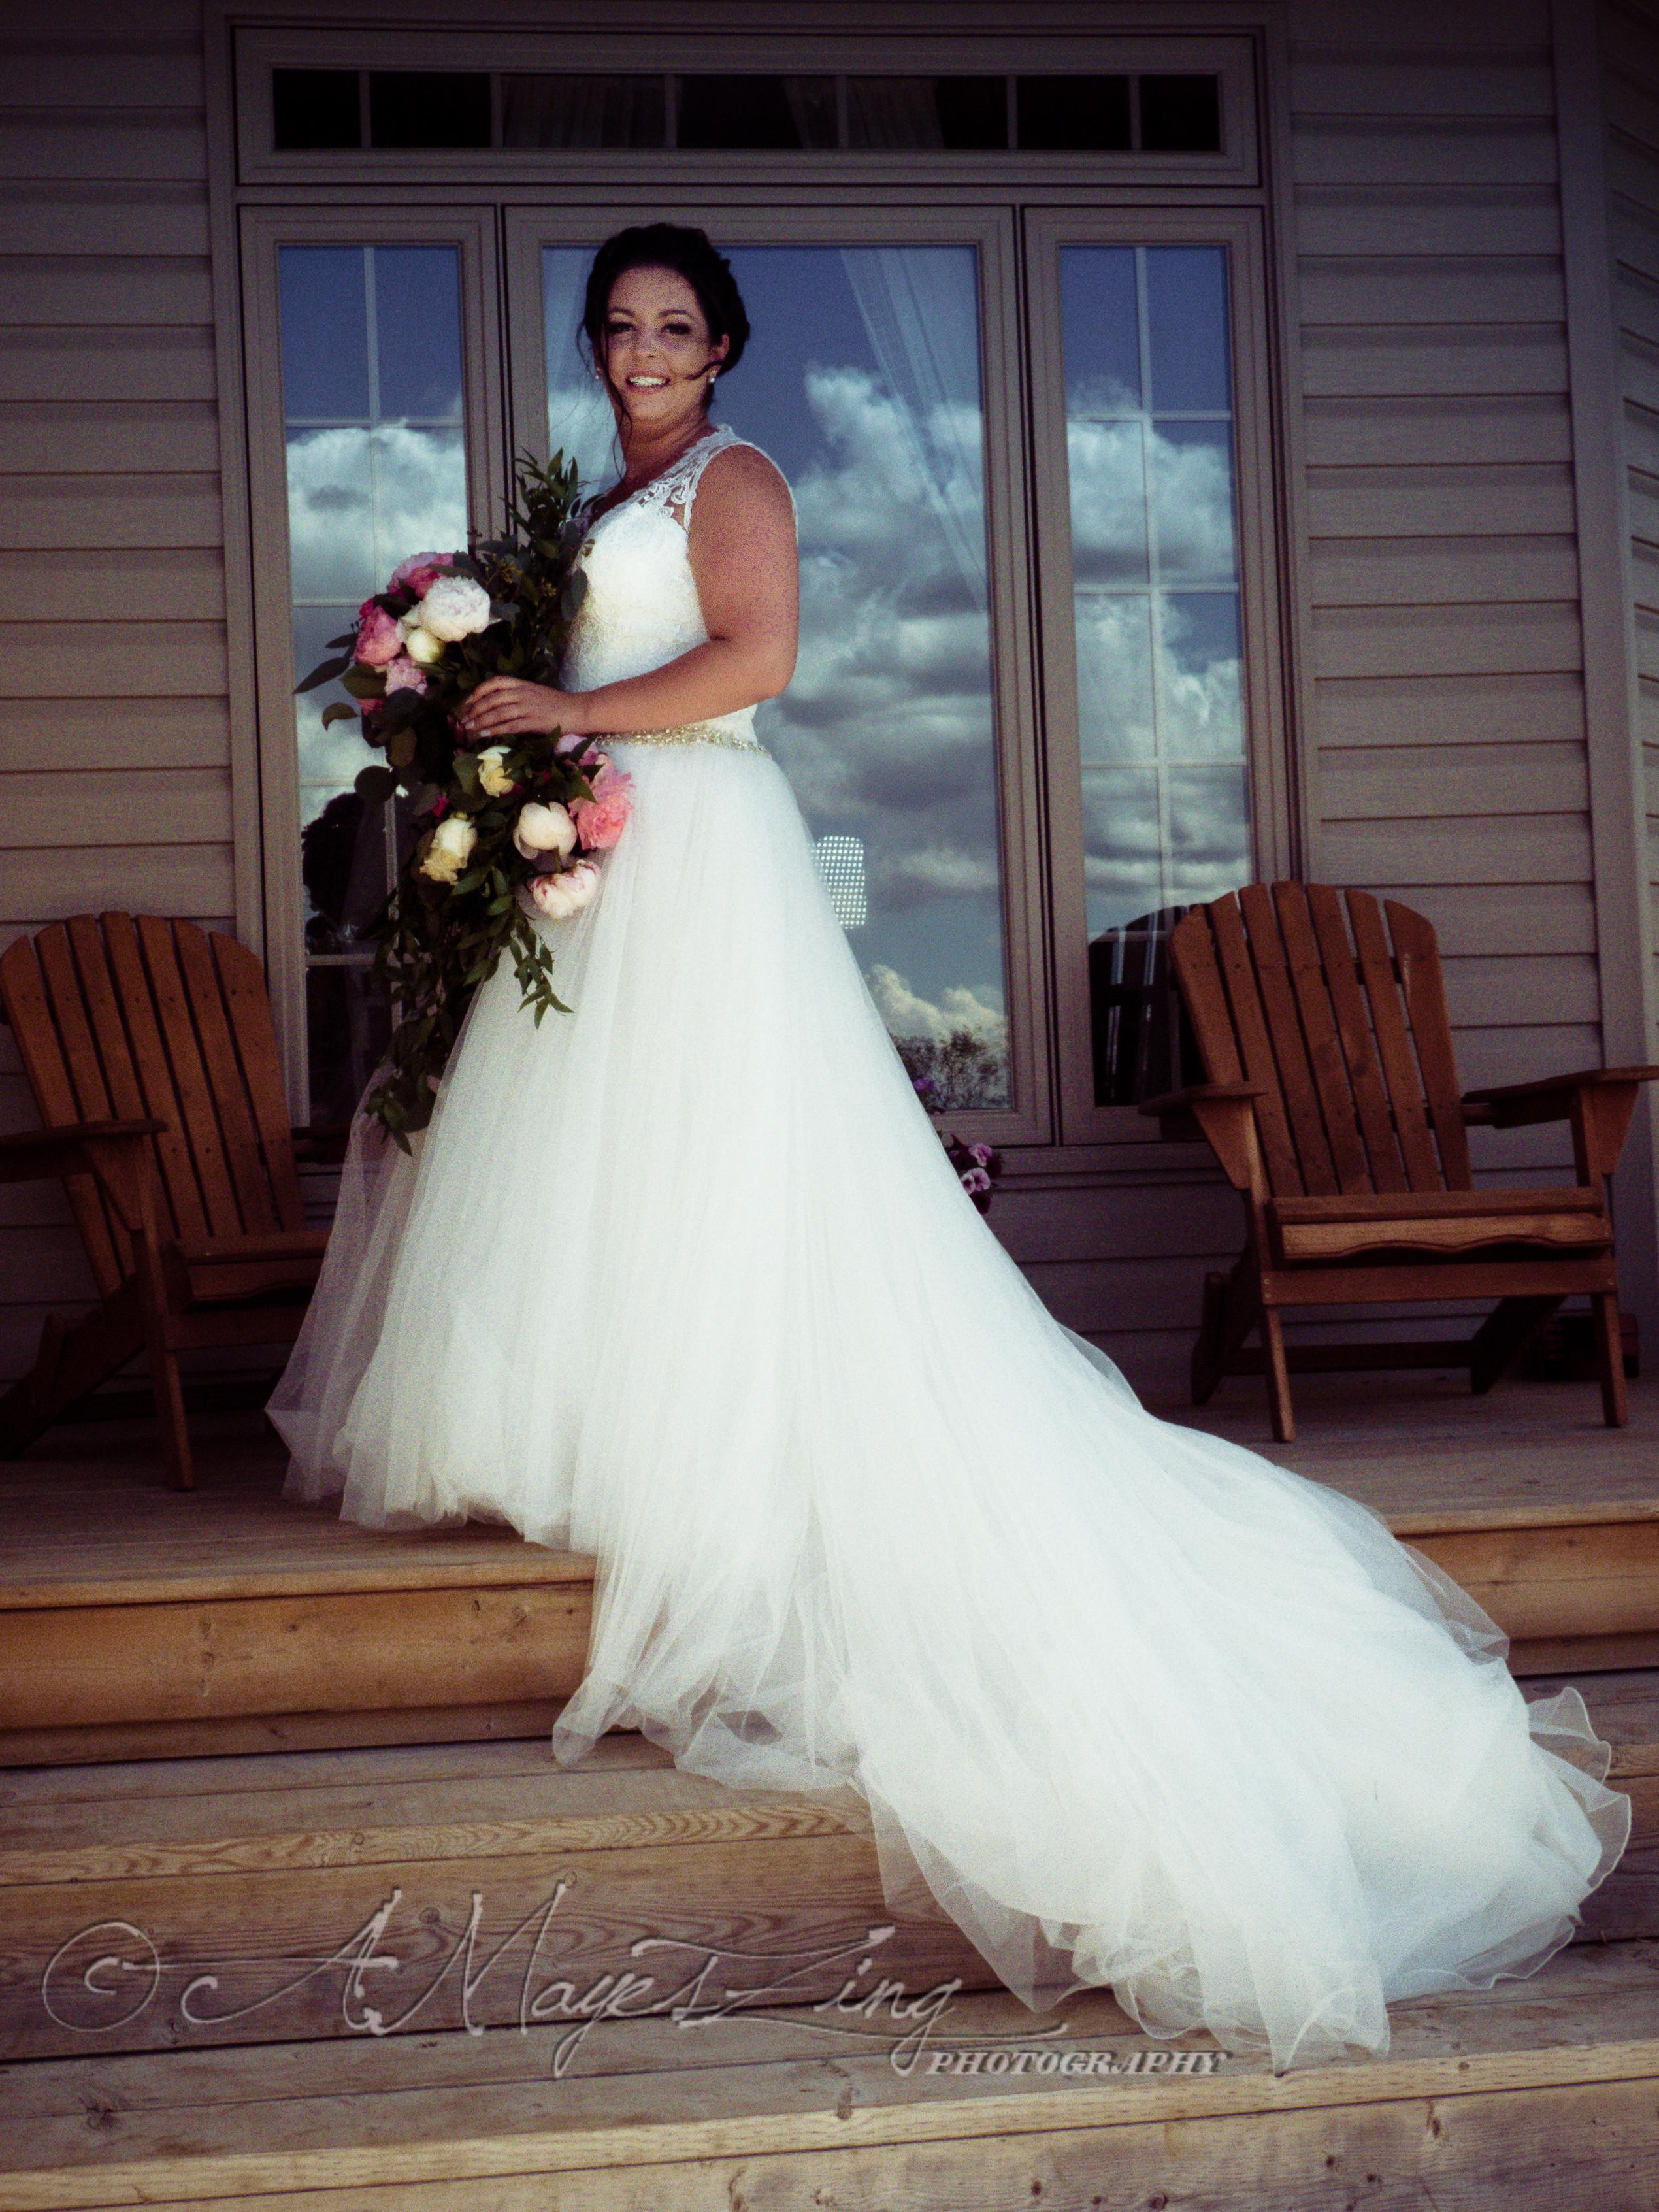 WEDDINGS / ENGAGEMENT